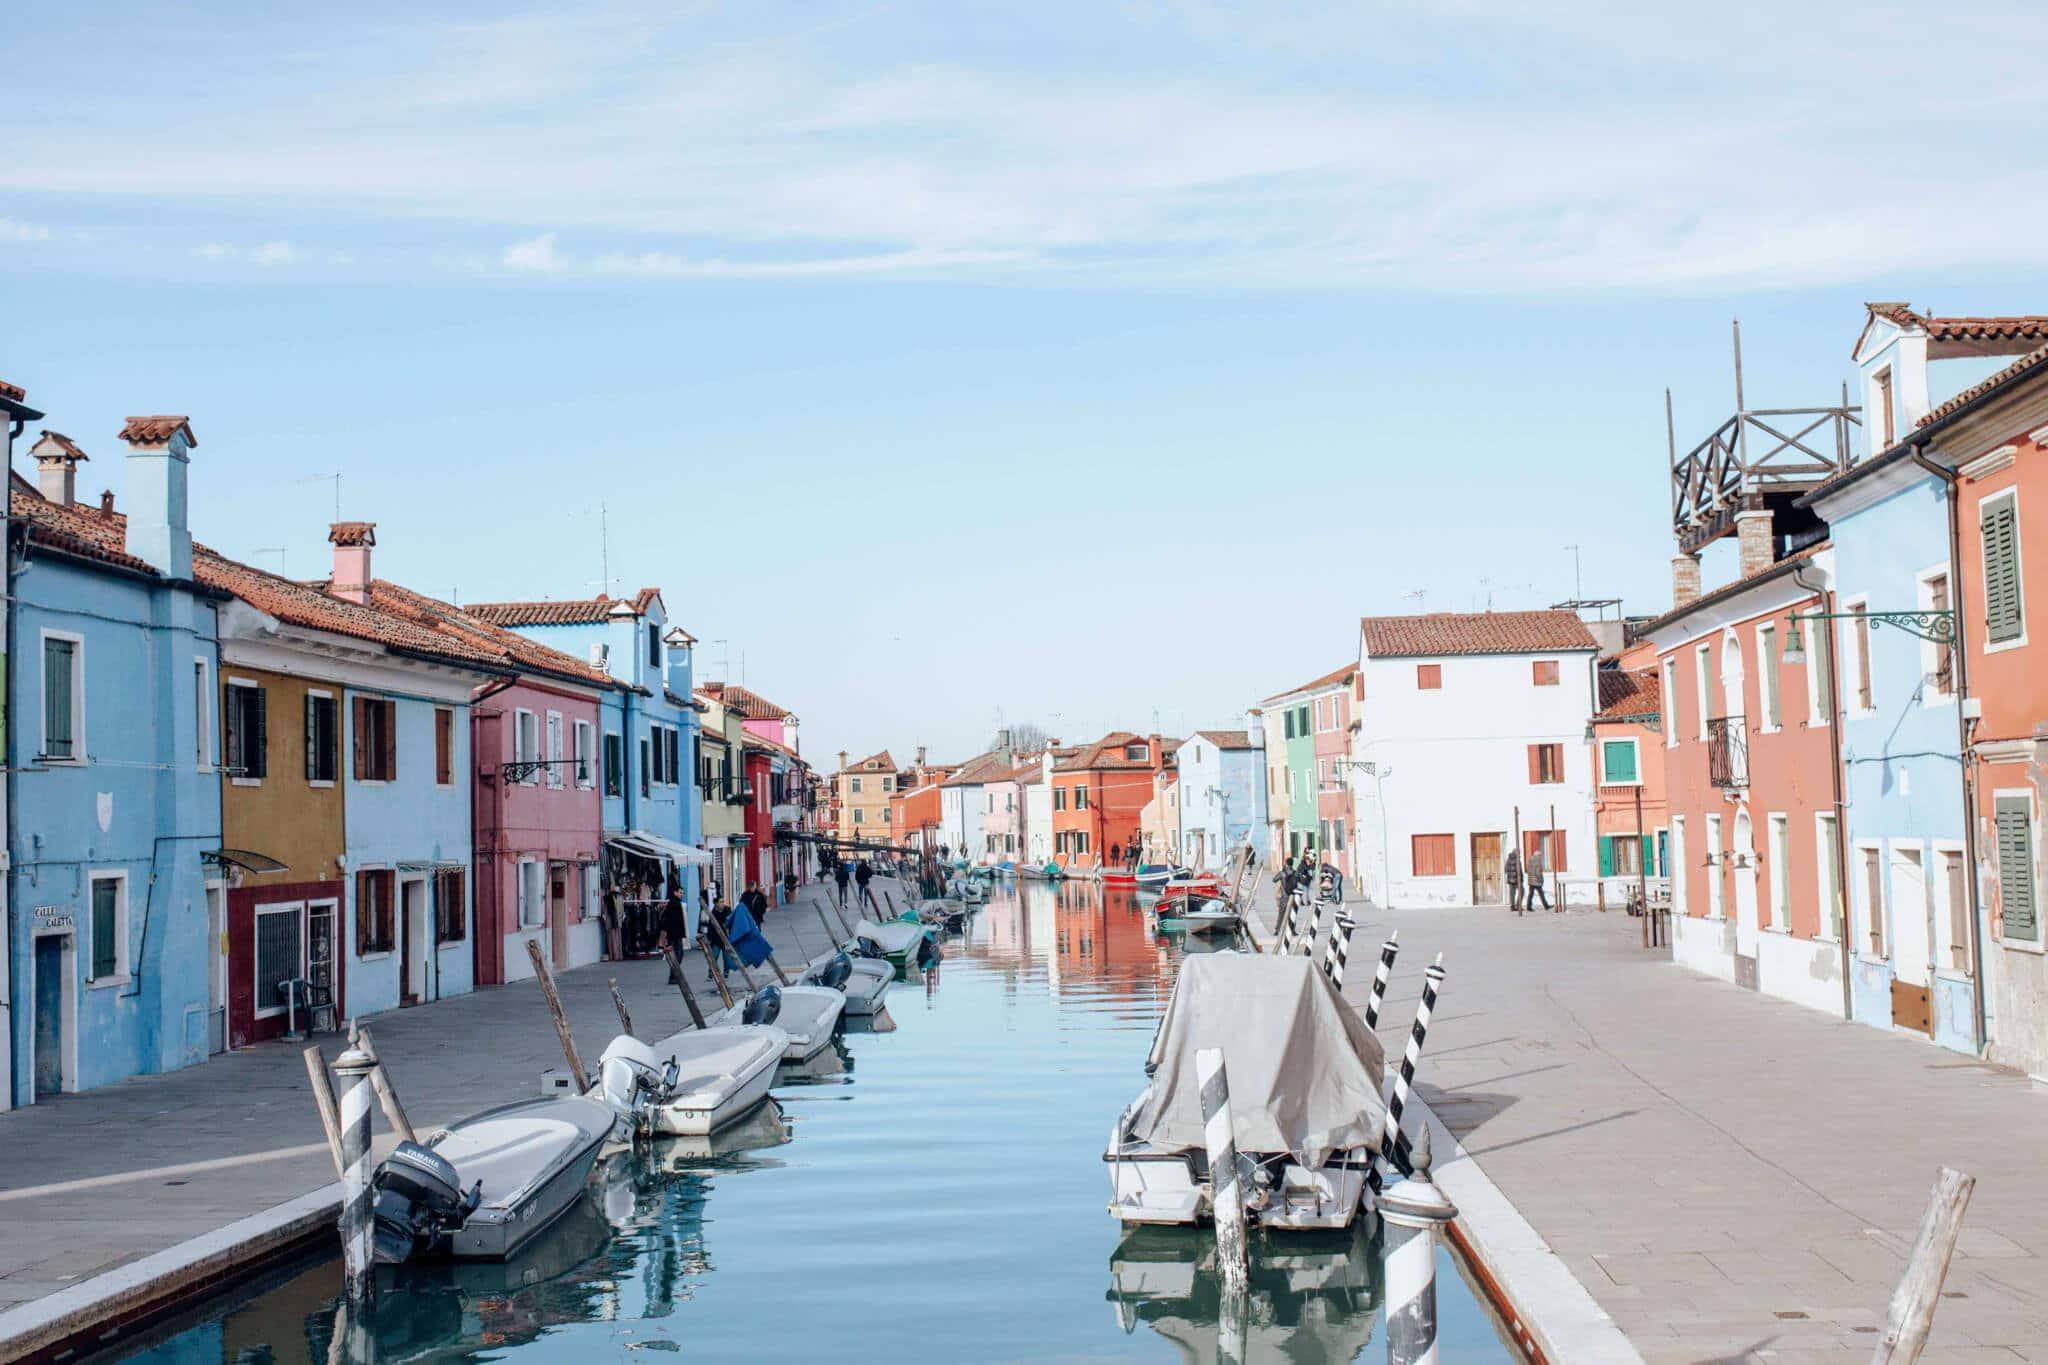 Venecia & Burano